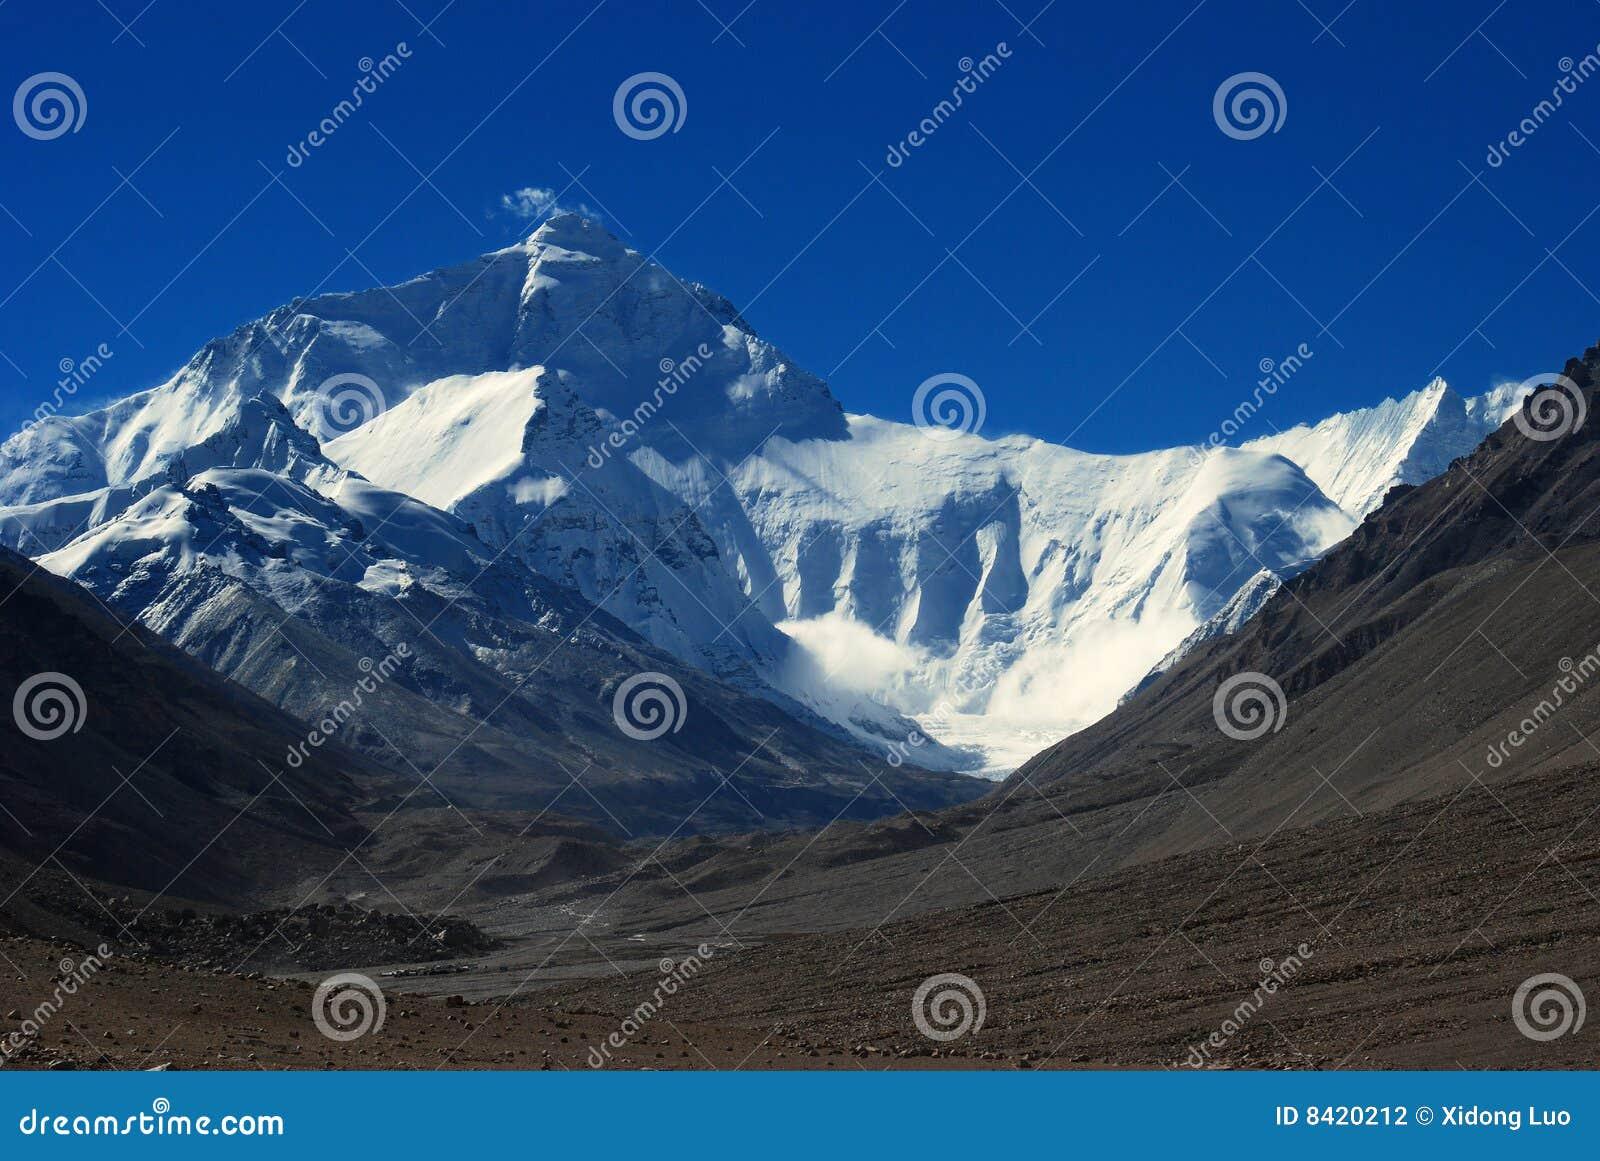 Everest mt